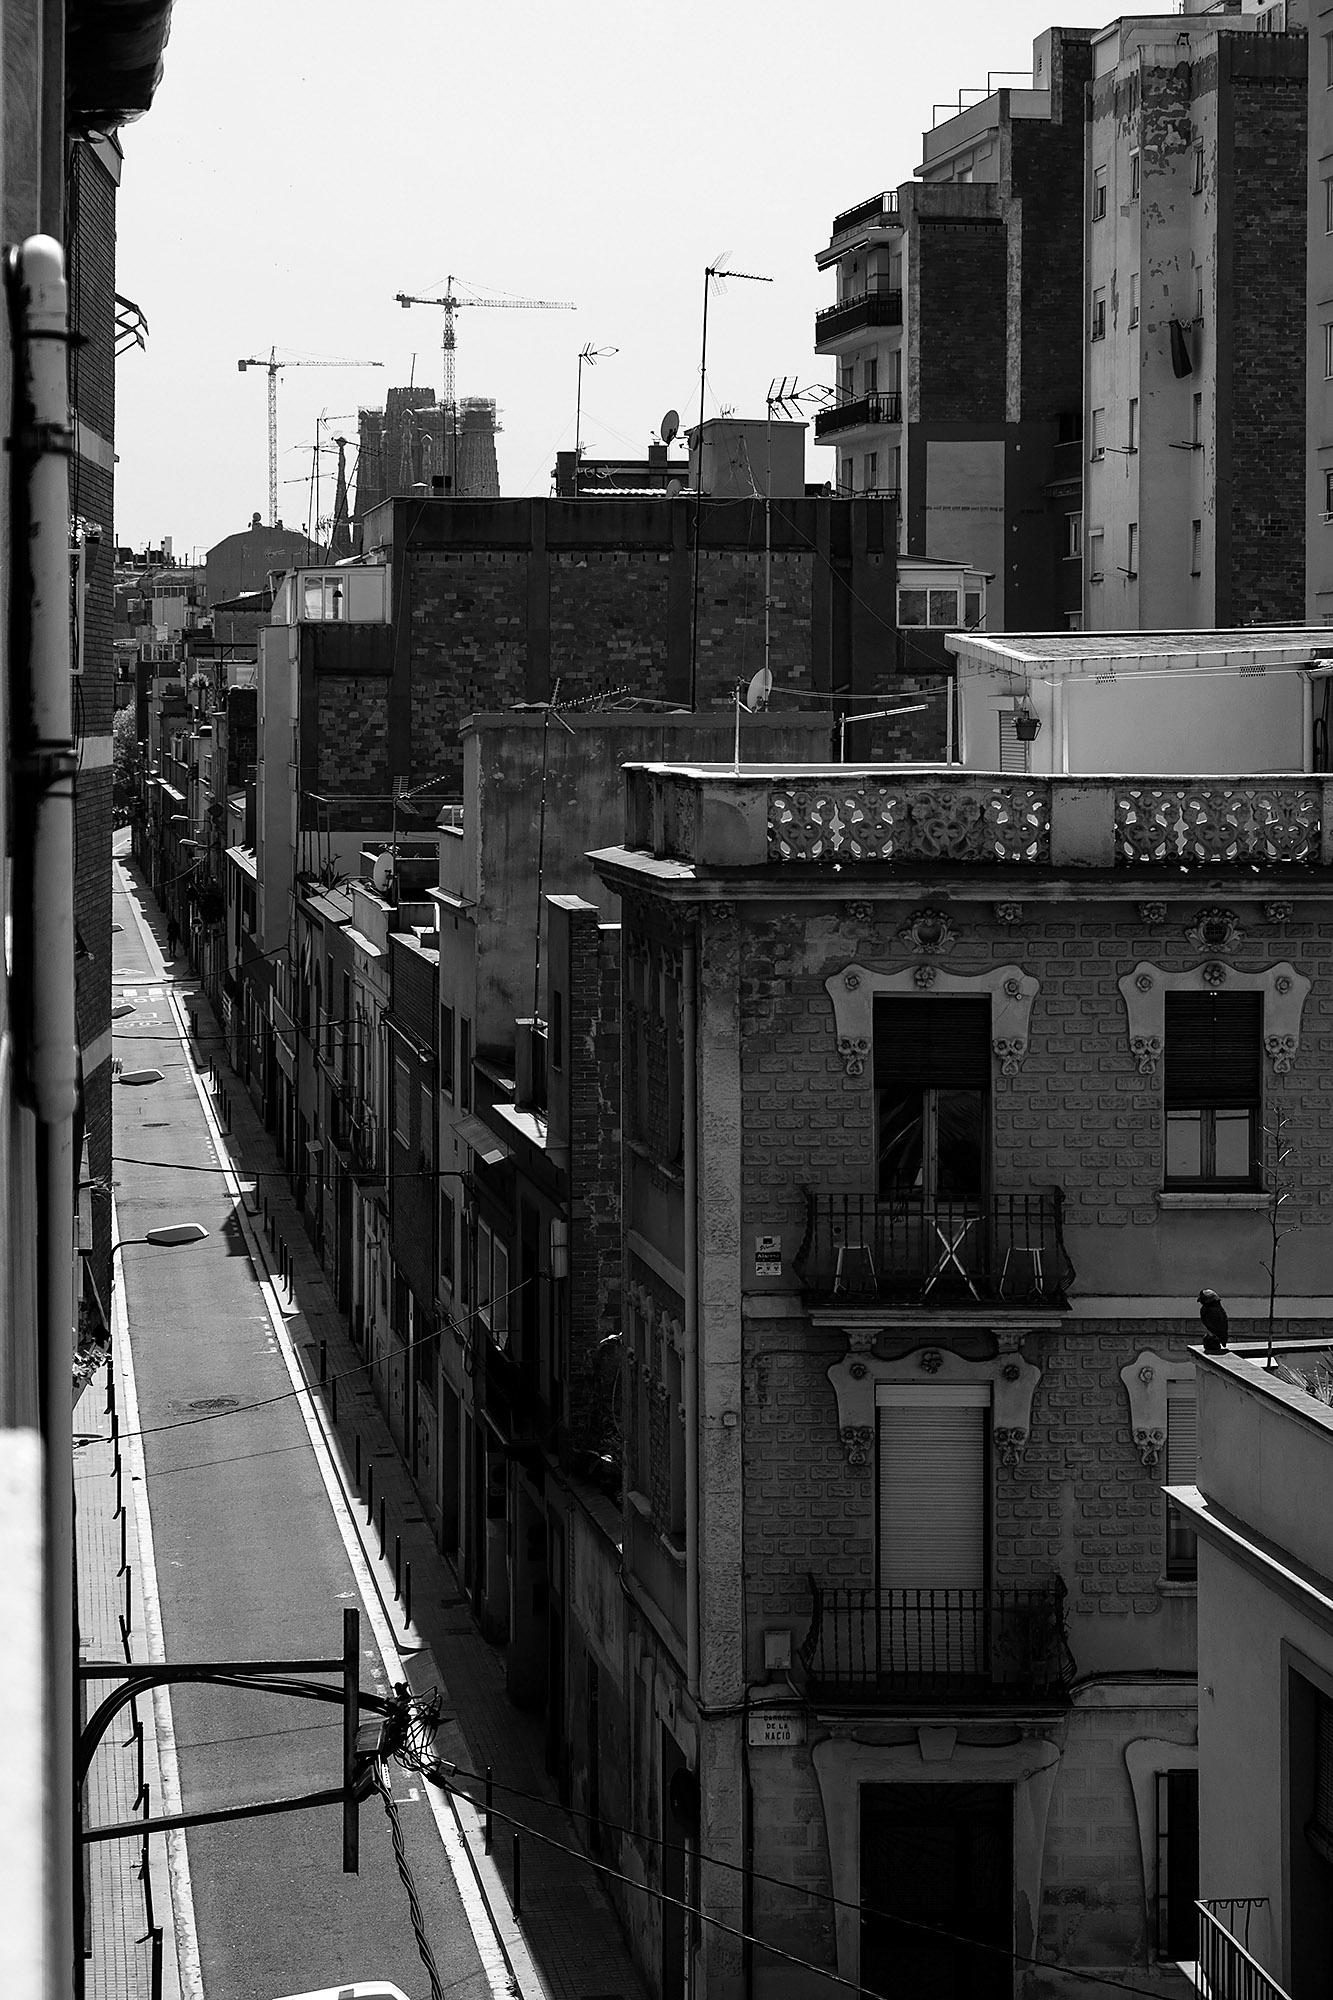 Lockdown Boredom: Deserted streets during the peak of the lockdown.